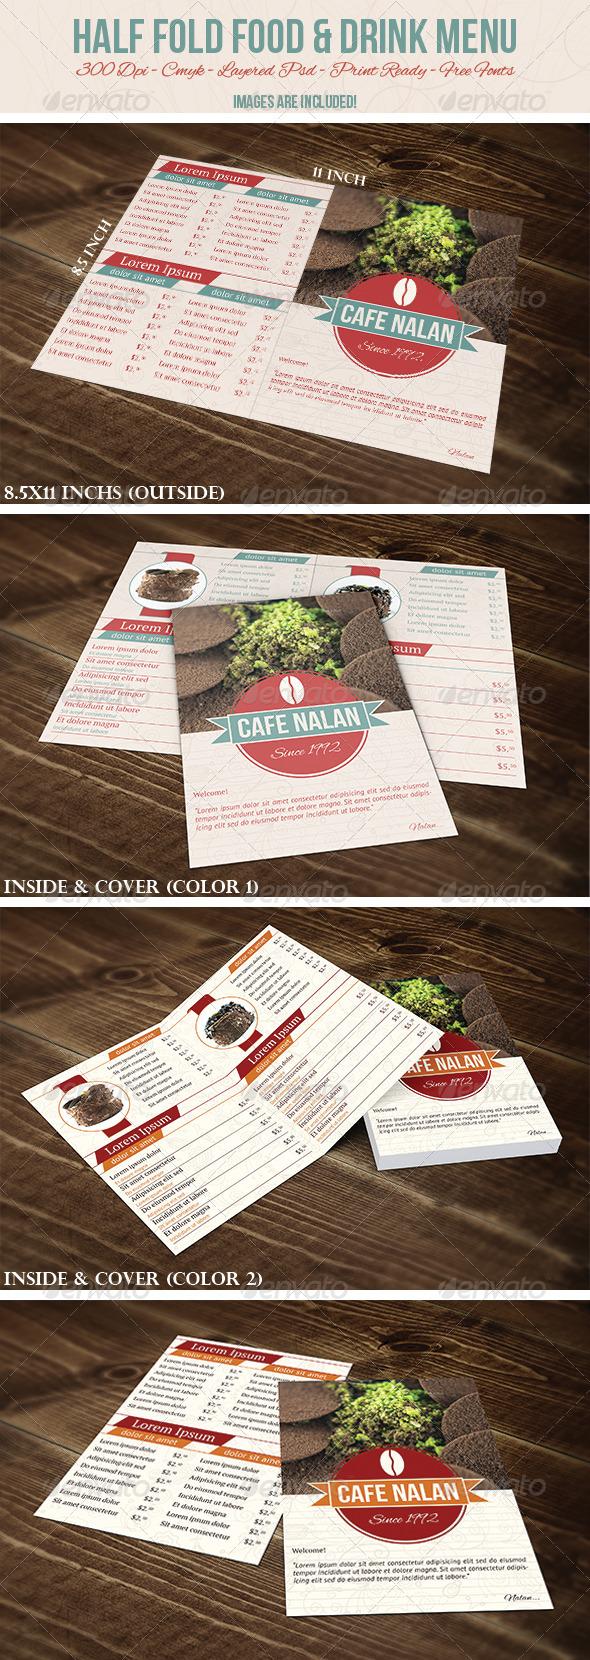 Half Fold Food & Drink Menu - Food Menus Print Templates